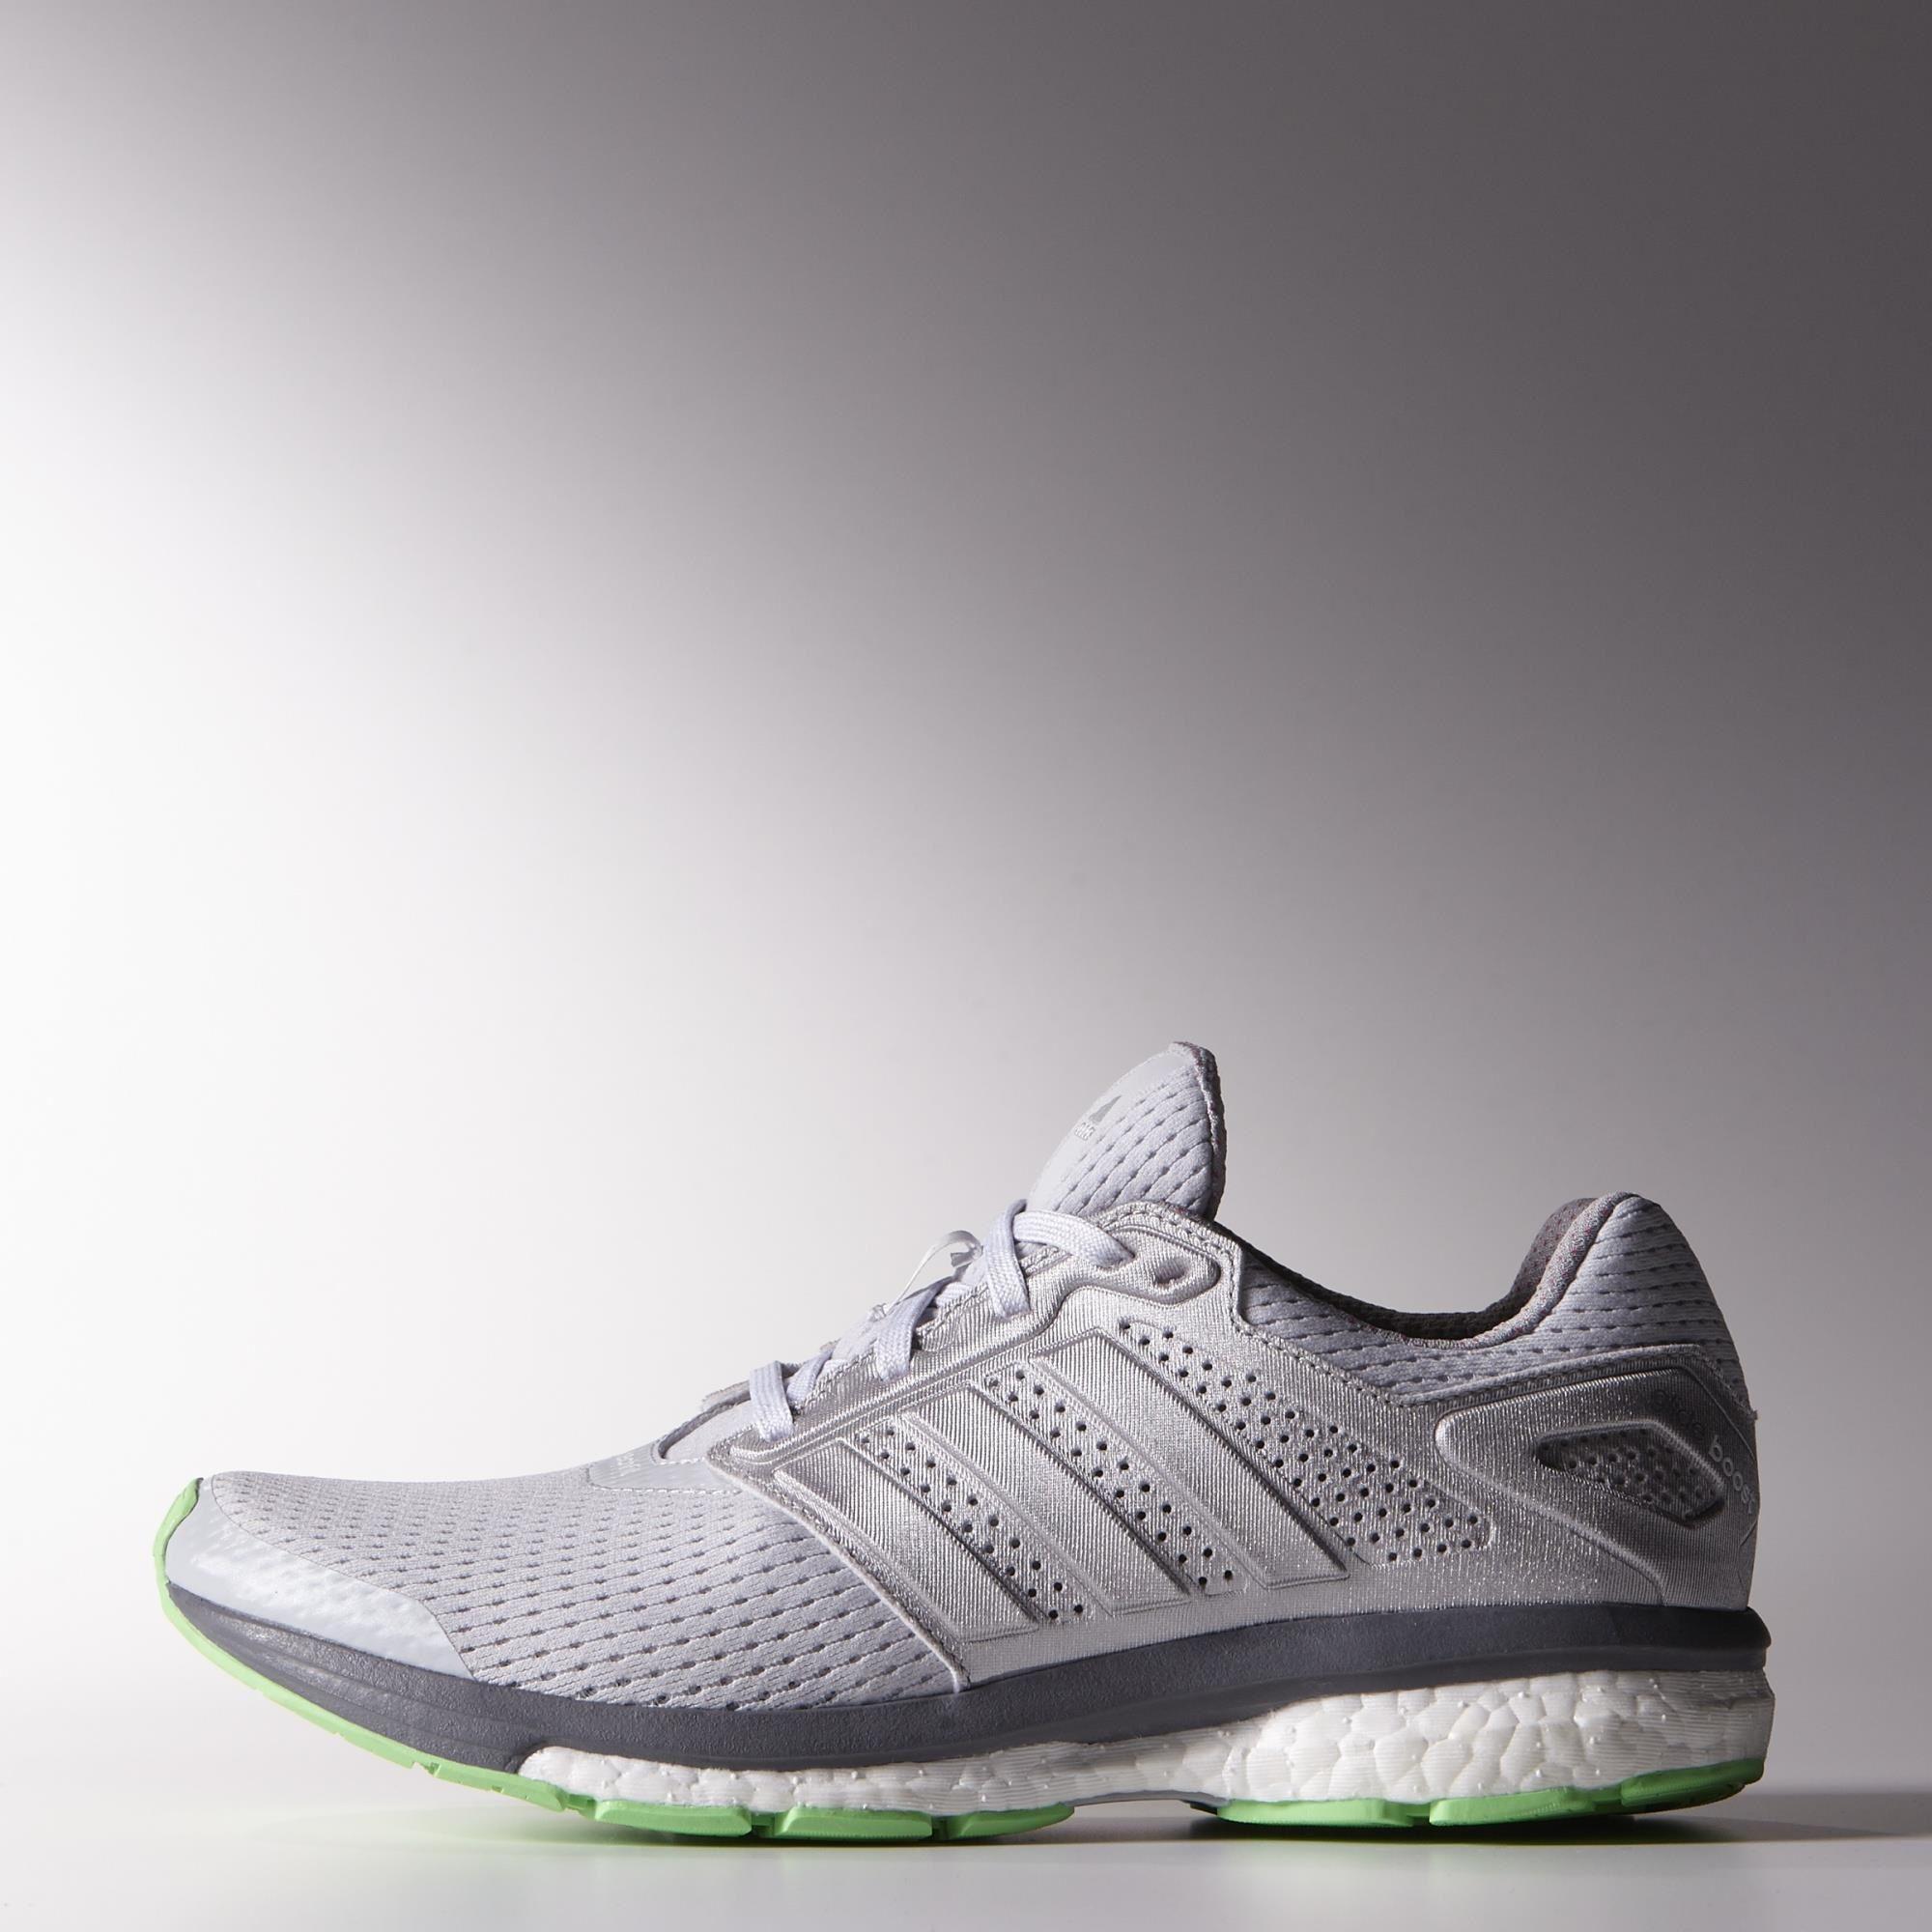 bf283a73a Adidas Womens Supernova Glide 7 Running Shoes - Grey Green - Tennisnuts.com